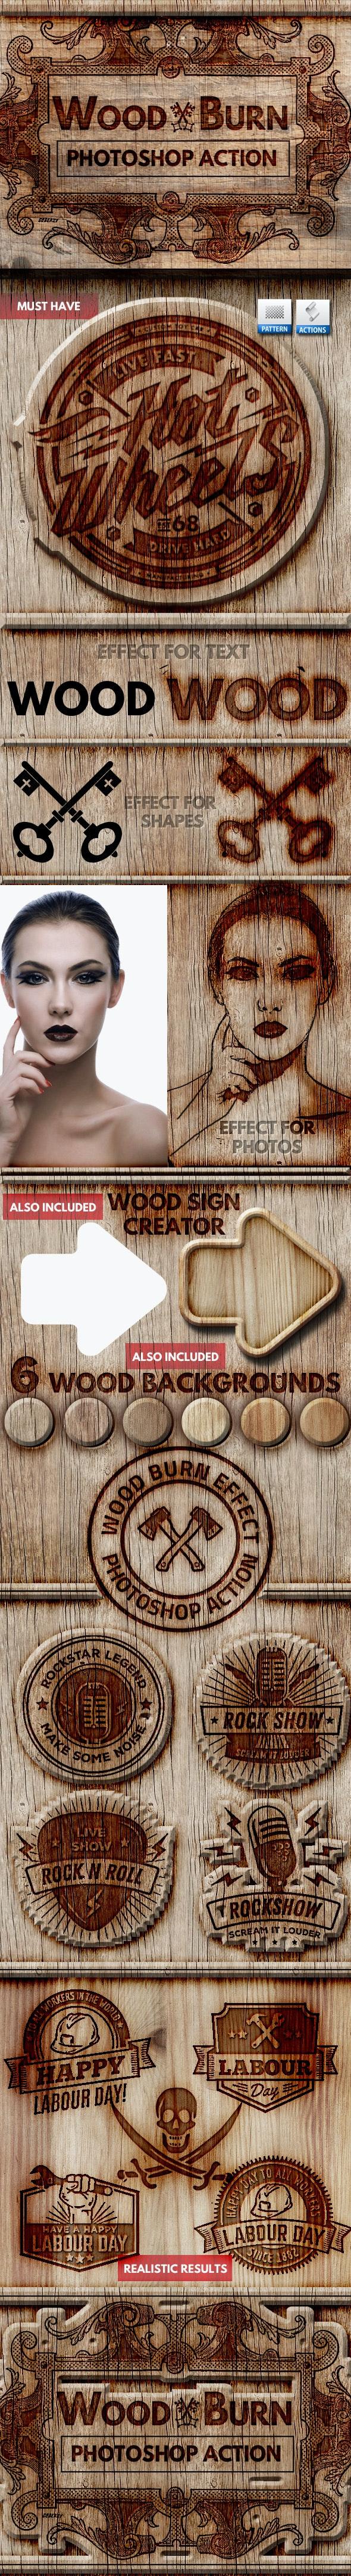 Wood Burn Effect Photoshop Action - Utilities Actions